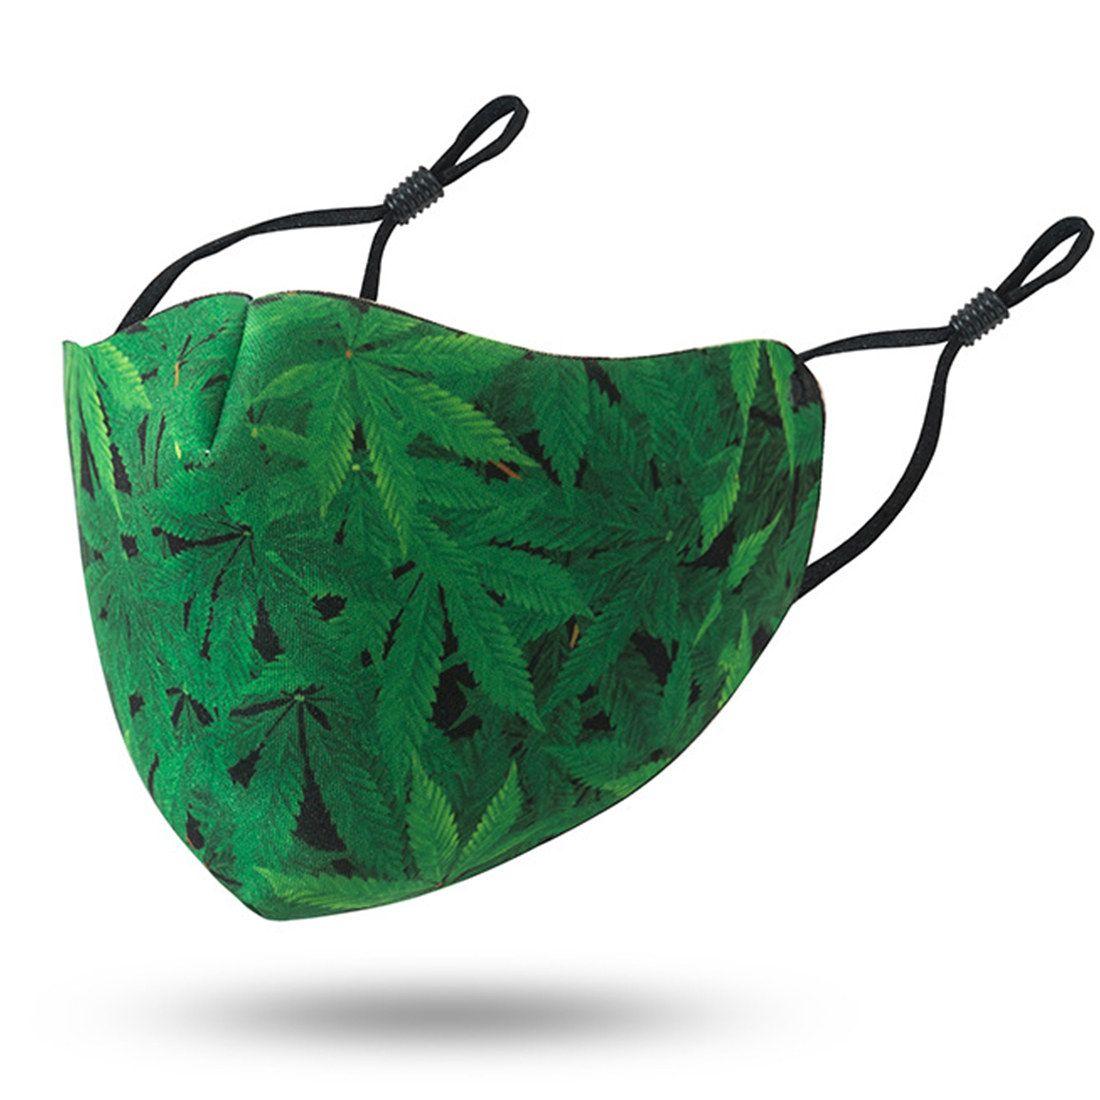 3D AHE209 돌고래 디자이너 얼굴 마스크 재사용 재미 코 마스크 Mascherine 패션 빨 천으로 녹색 잎 별이 빛나는 하늘 성인 마스크 카모